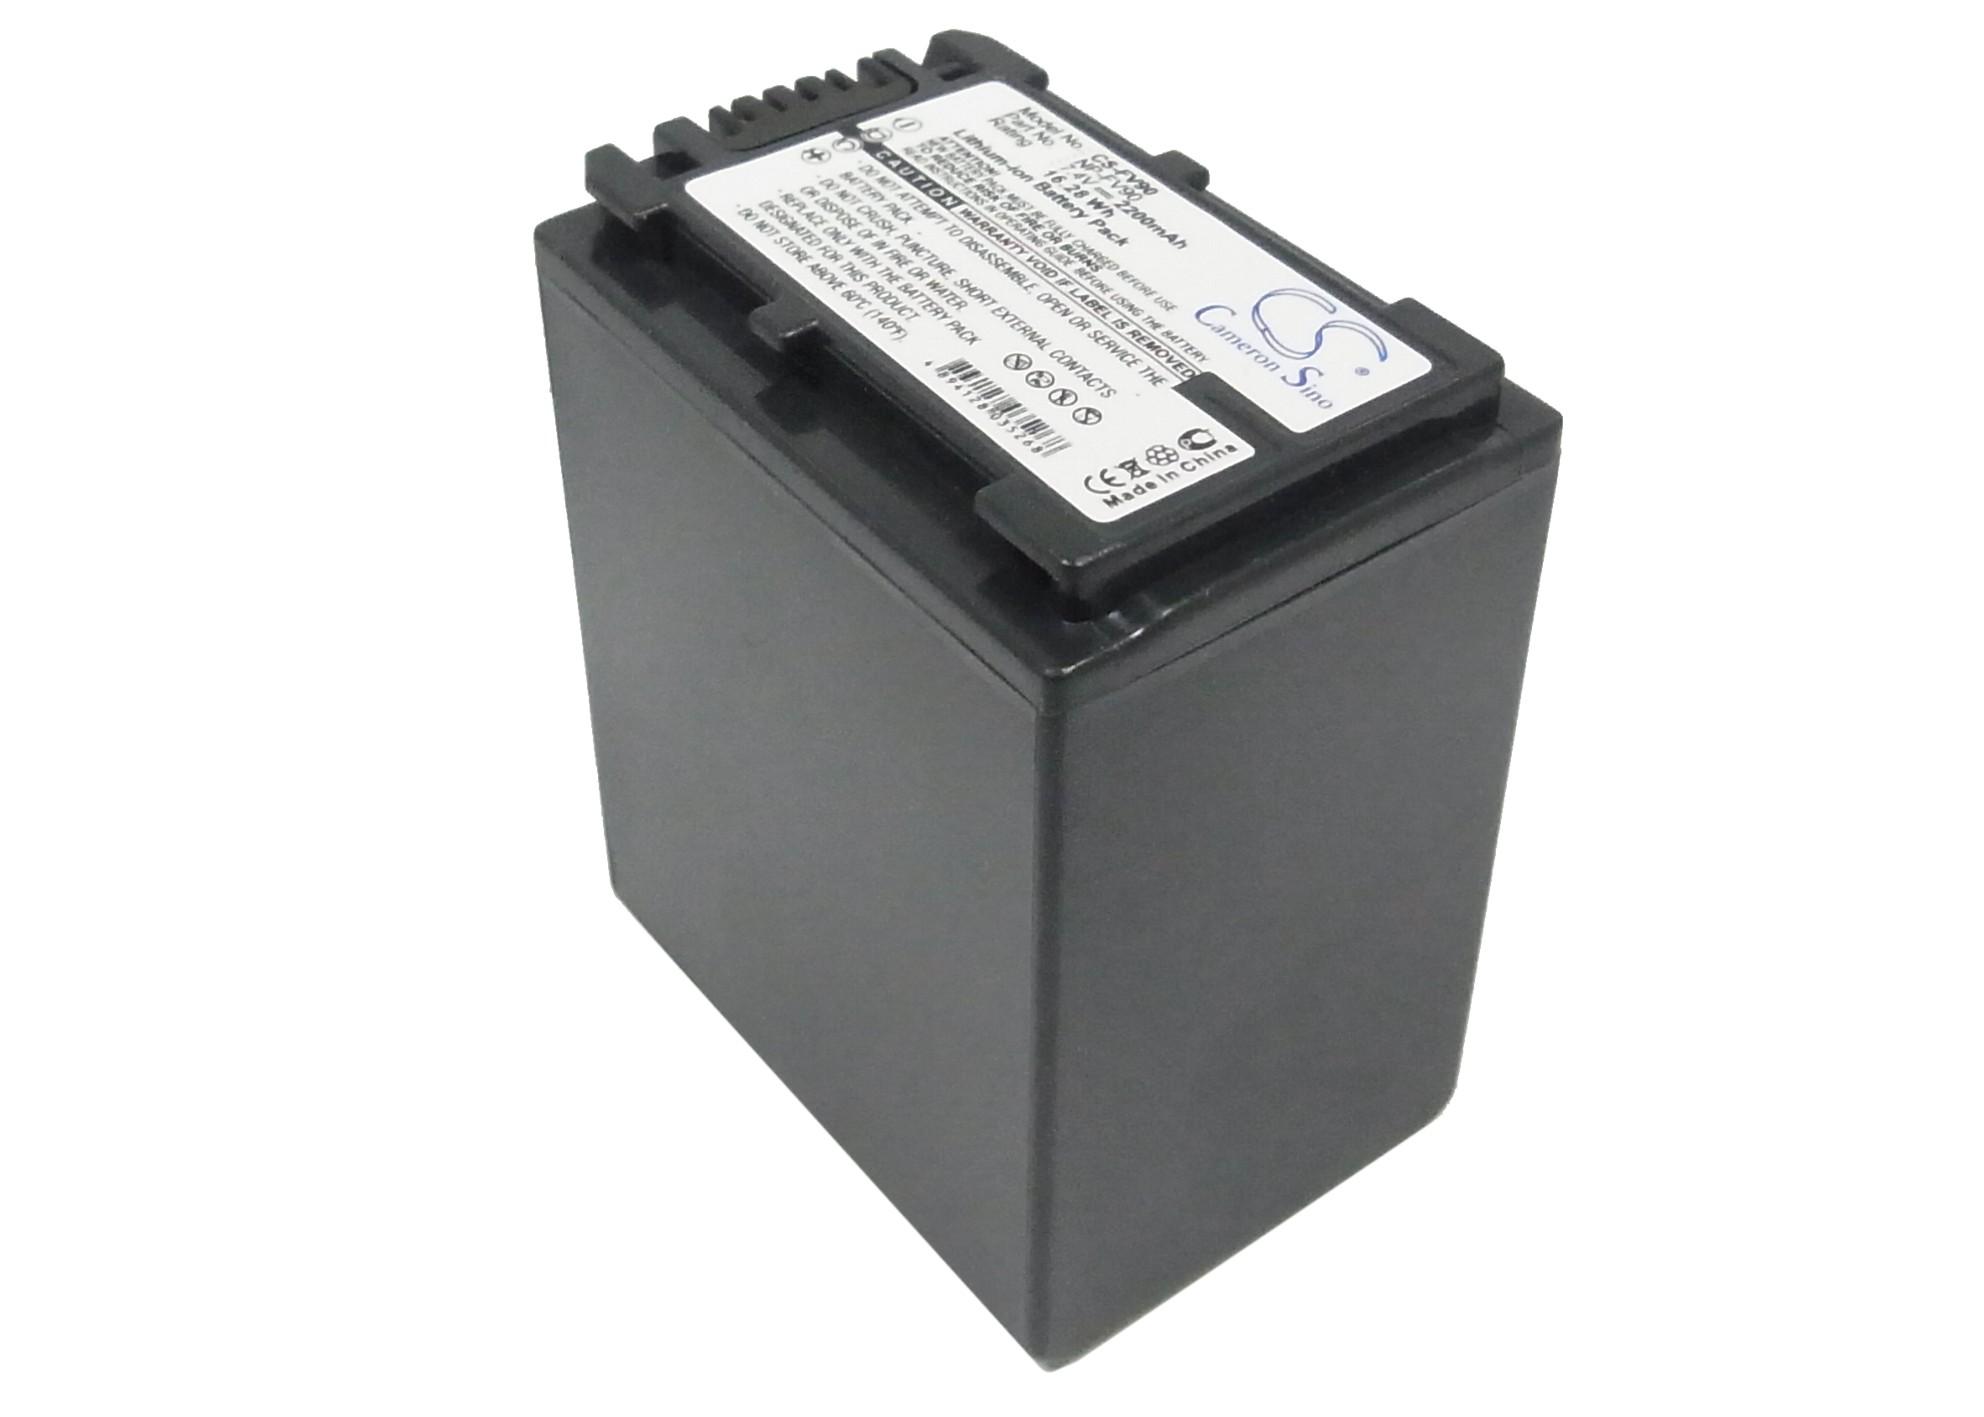 Cameron Sino baterie do kamer a fotoaparátů pro SONY DCR-SR68E 7.4V Li-ion 2200mAh černá - neoriginální